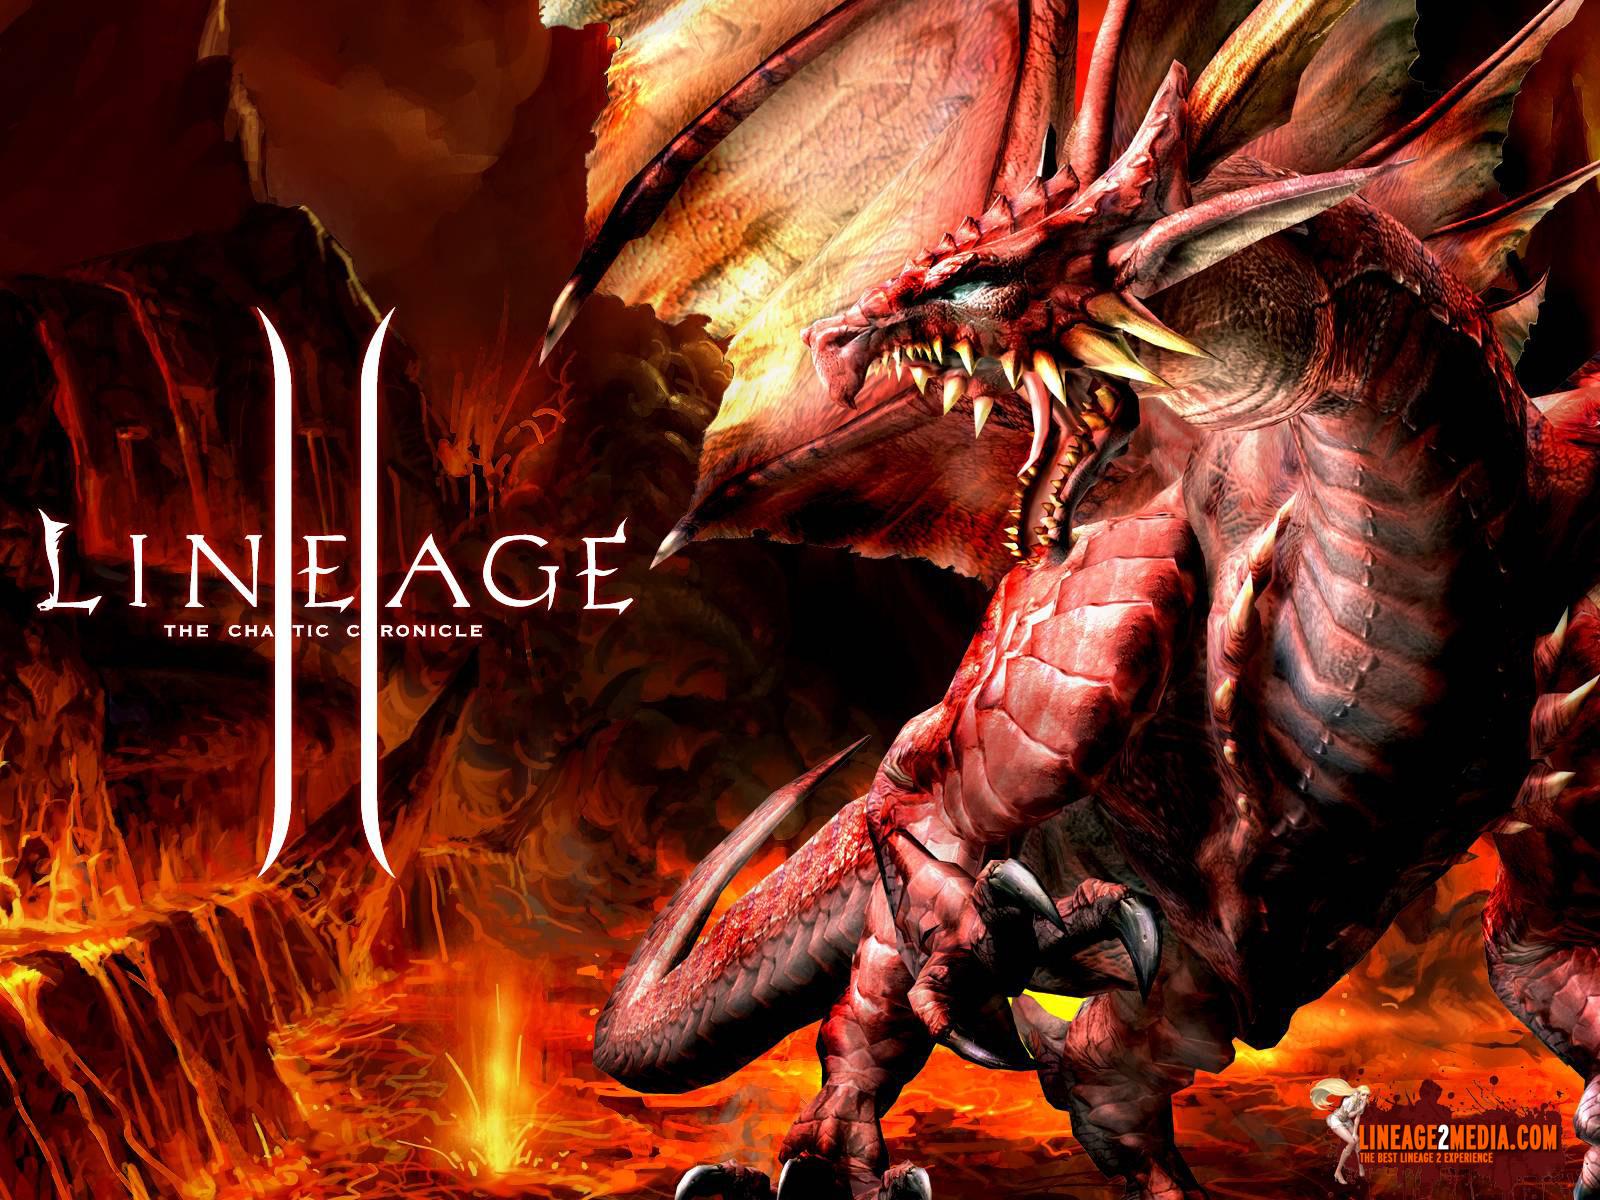 http://1.bp.blogspot.com/_IR4o7w_H7gc/TEWOqXJkXtI/AAAAAAAAABA/8gULgy8QrtE/s1600/lineage2wallpapervalakaea0.jpg